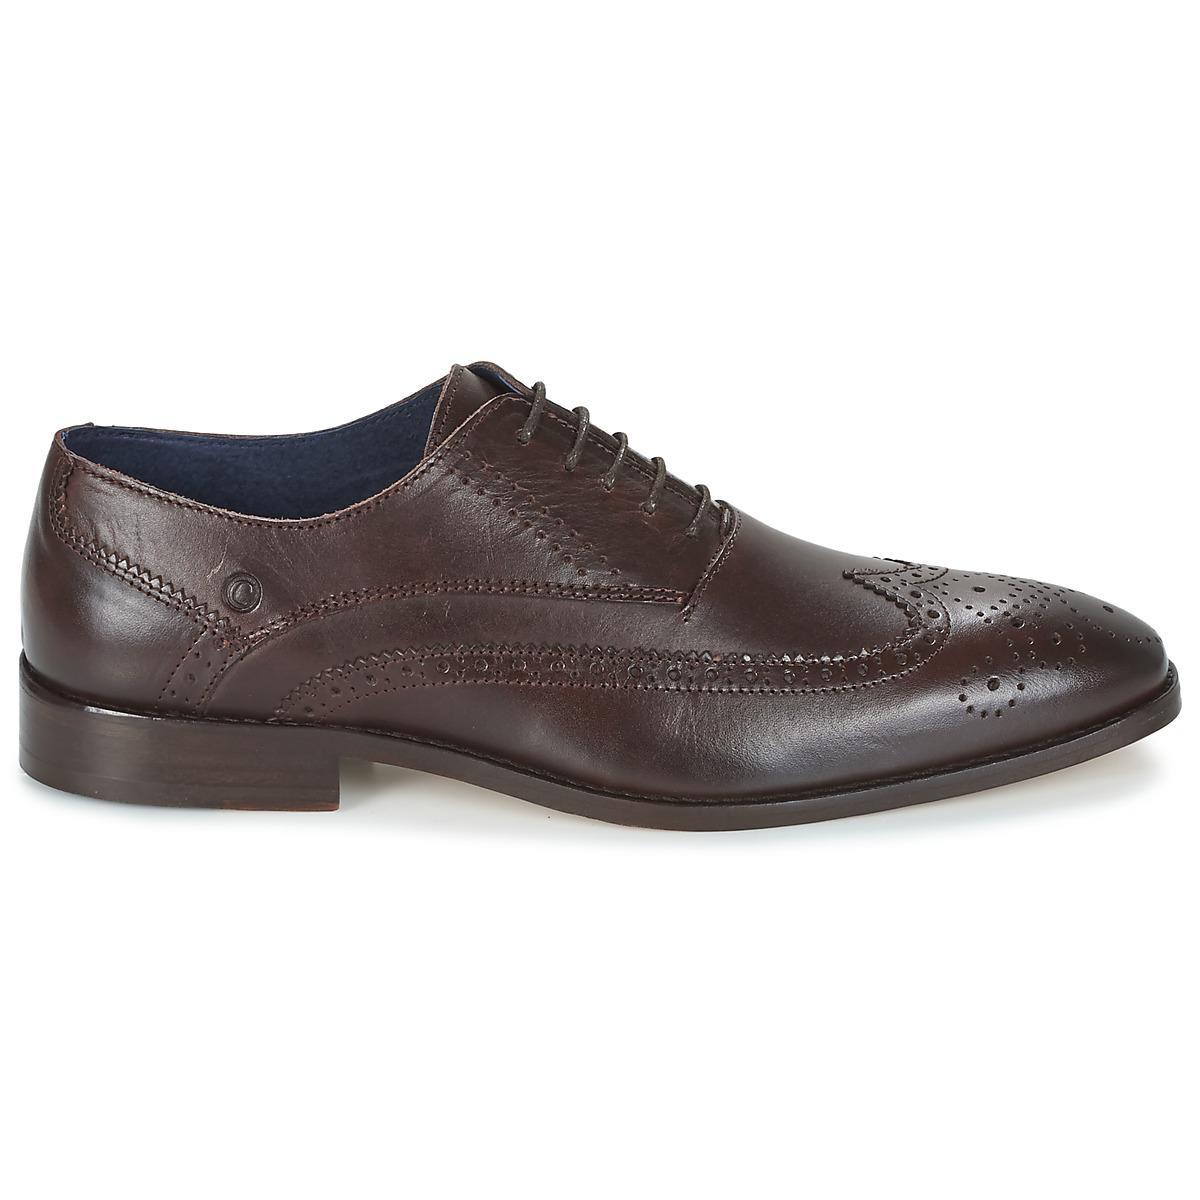 Carlington Leather Gasti Men's Smart / Formal Shoes In Brown for Men